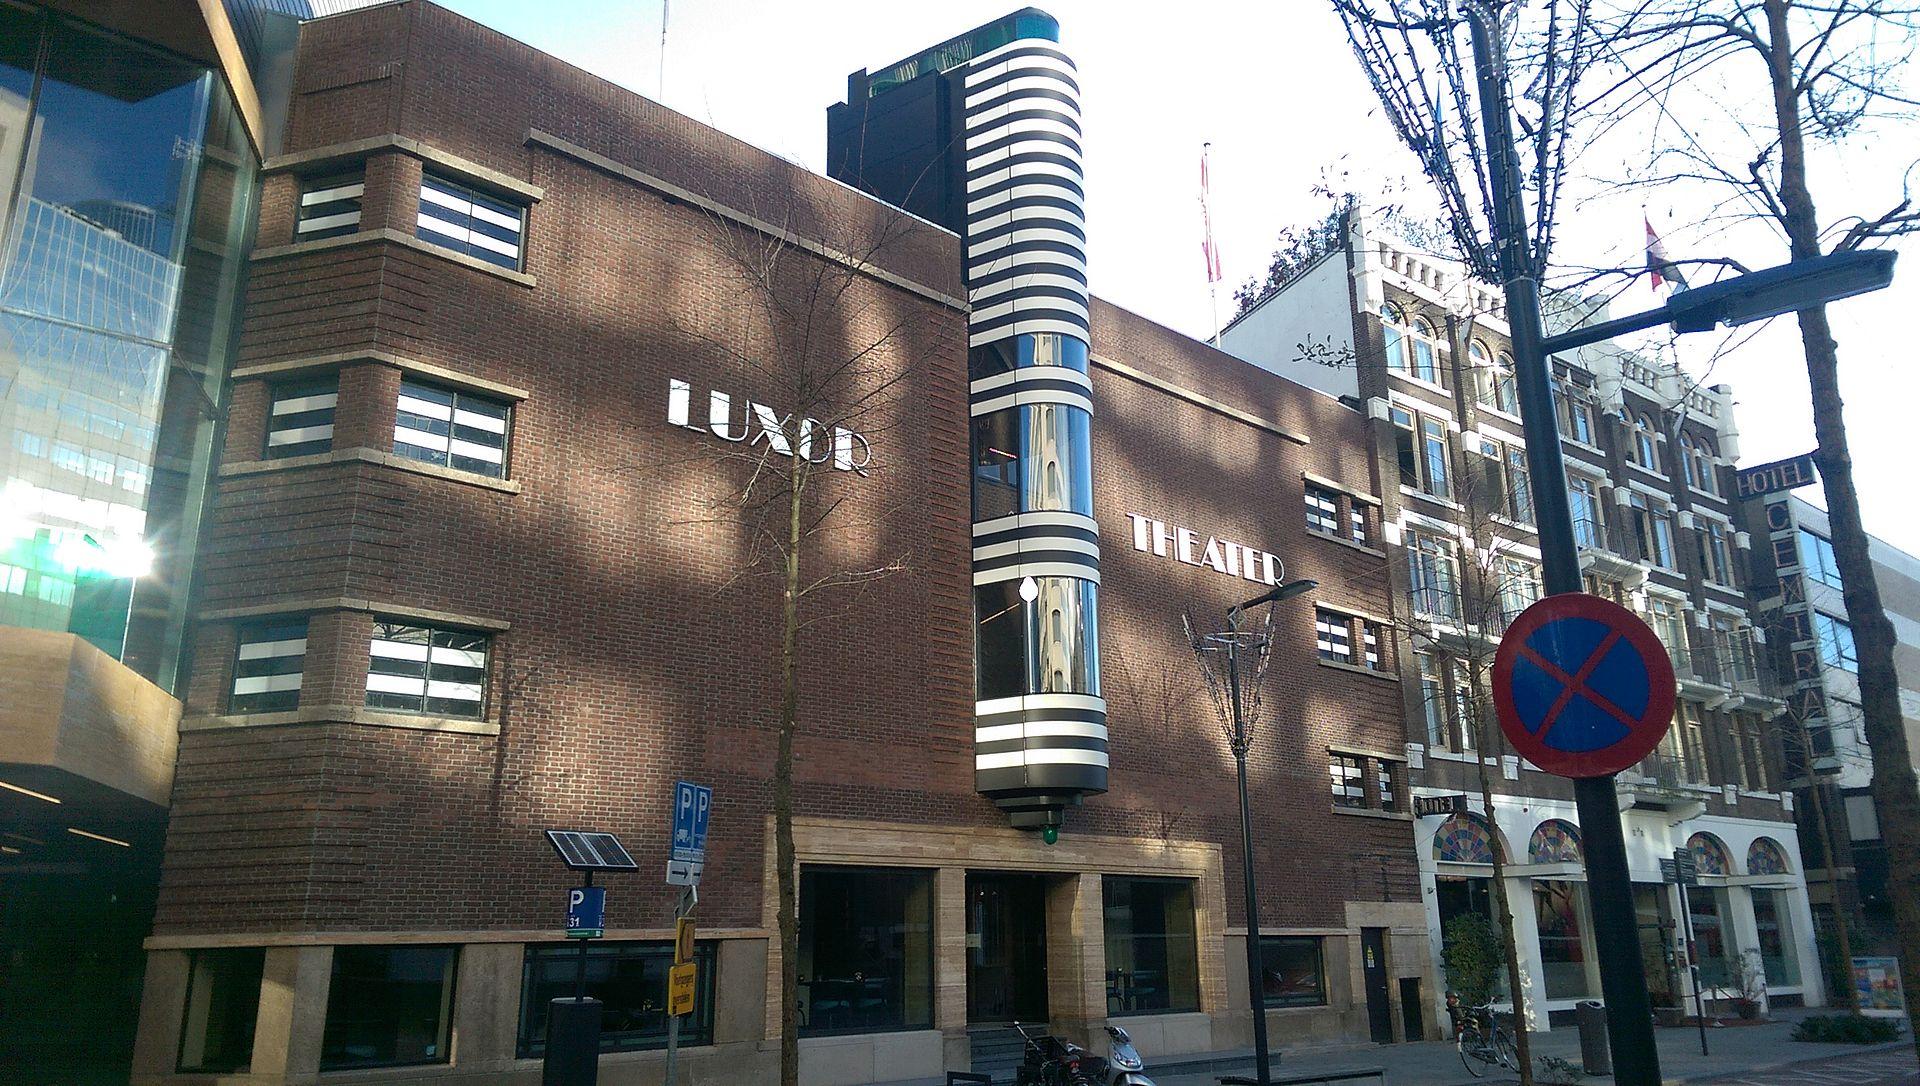 Oude Luxor Theater Rotterdam (Rotterdam)